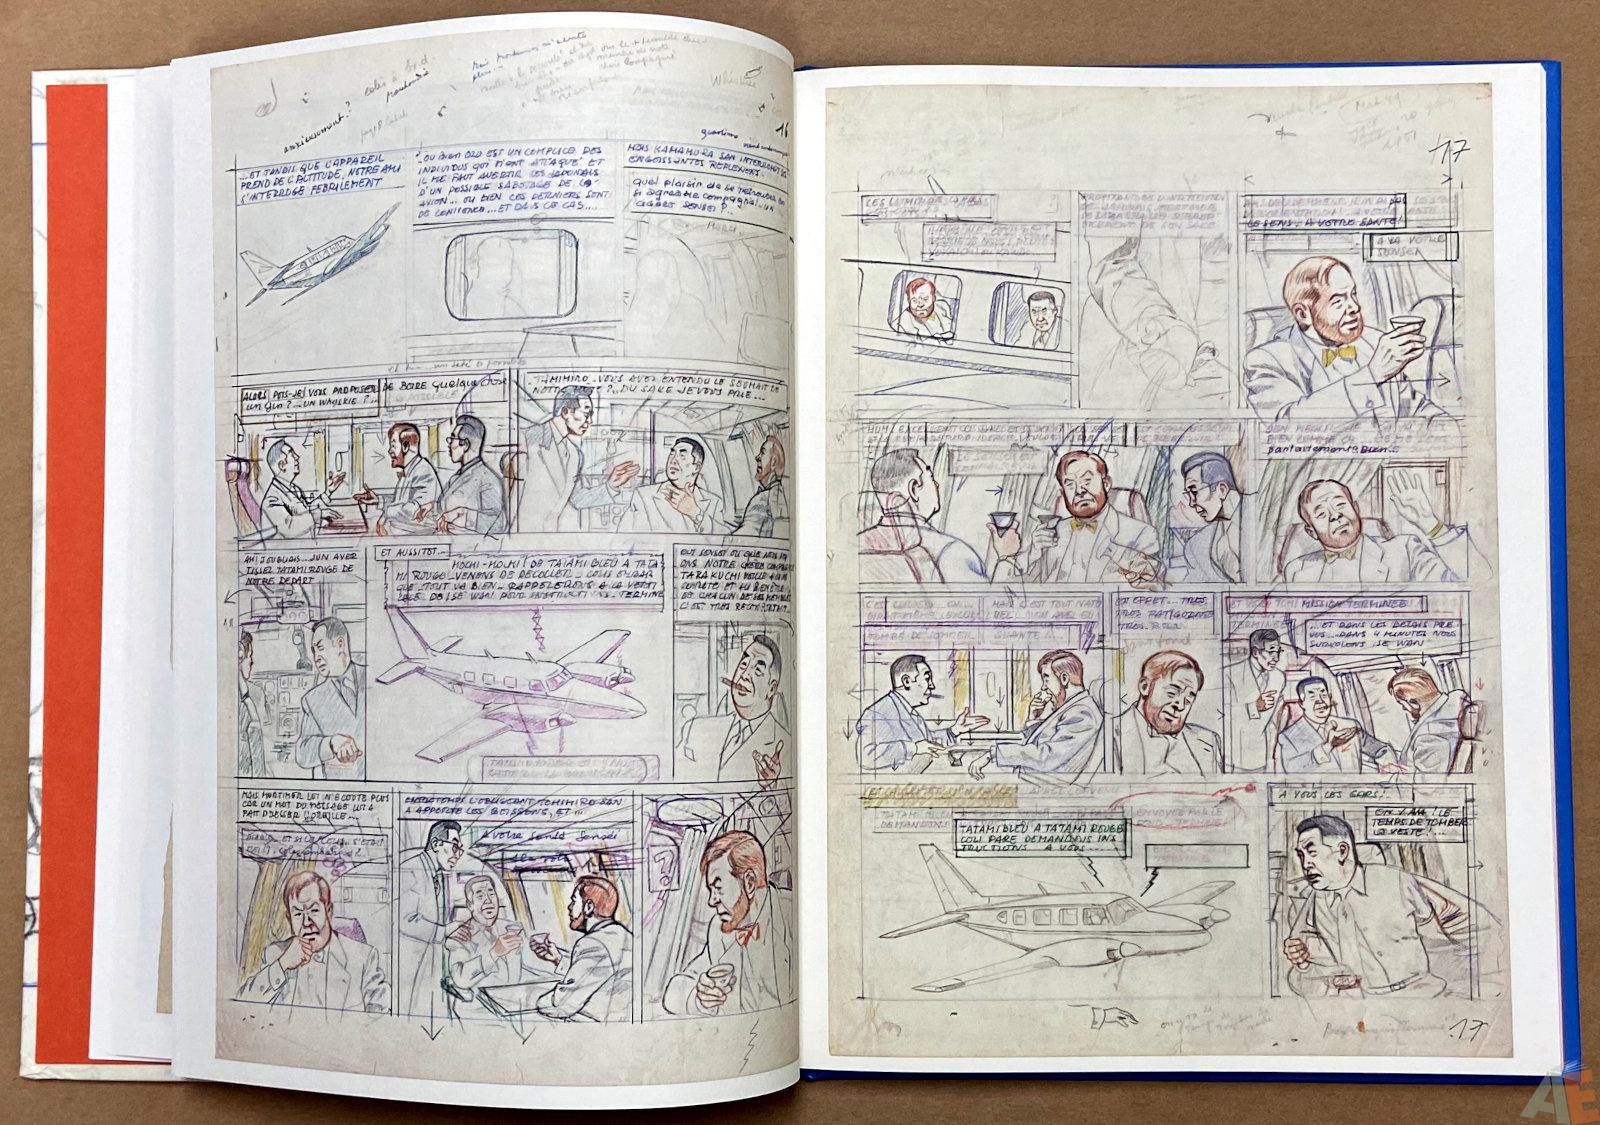 Les 3 Formules Du Professeur Sato Decoupage Original interior 4